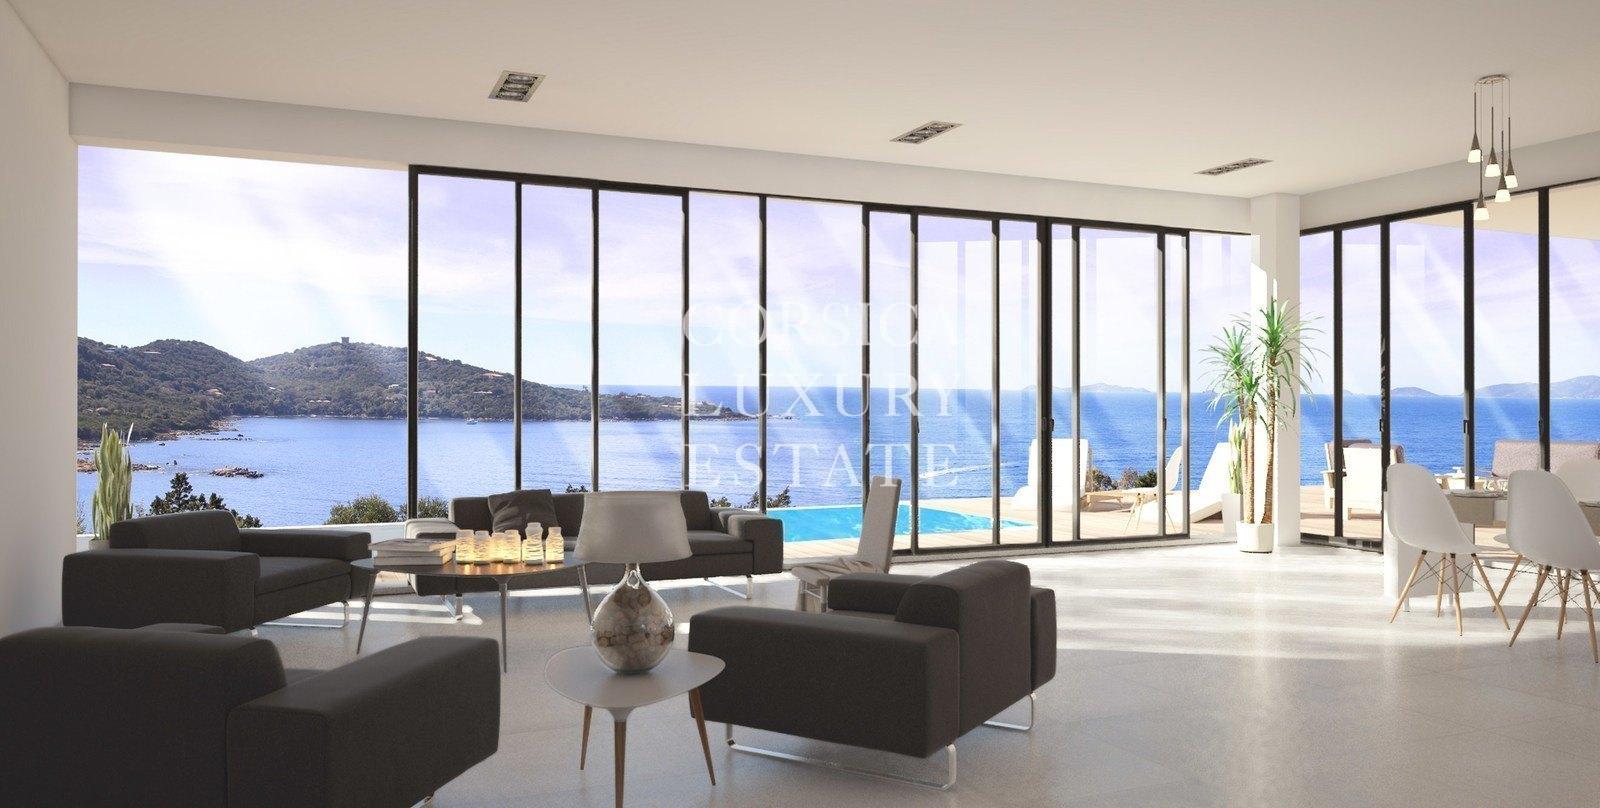 Coti chiavari proche plage villa neuve vendre - La contemporaine residence de plage las palmeras ...